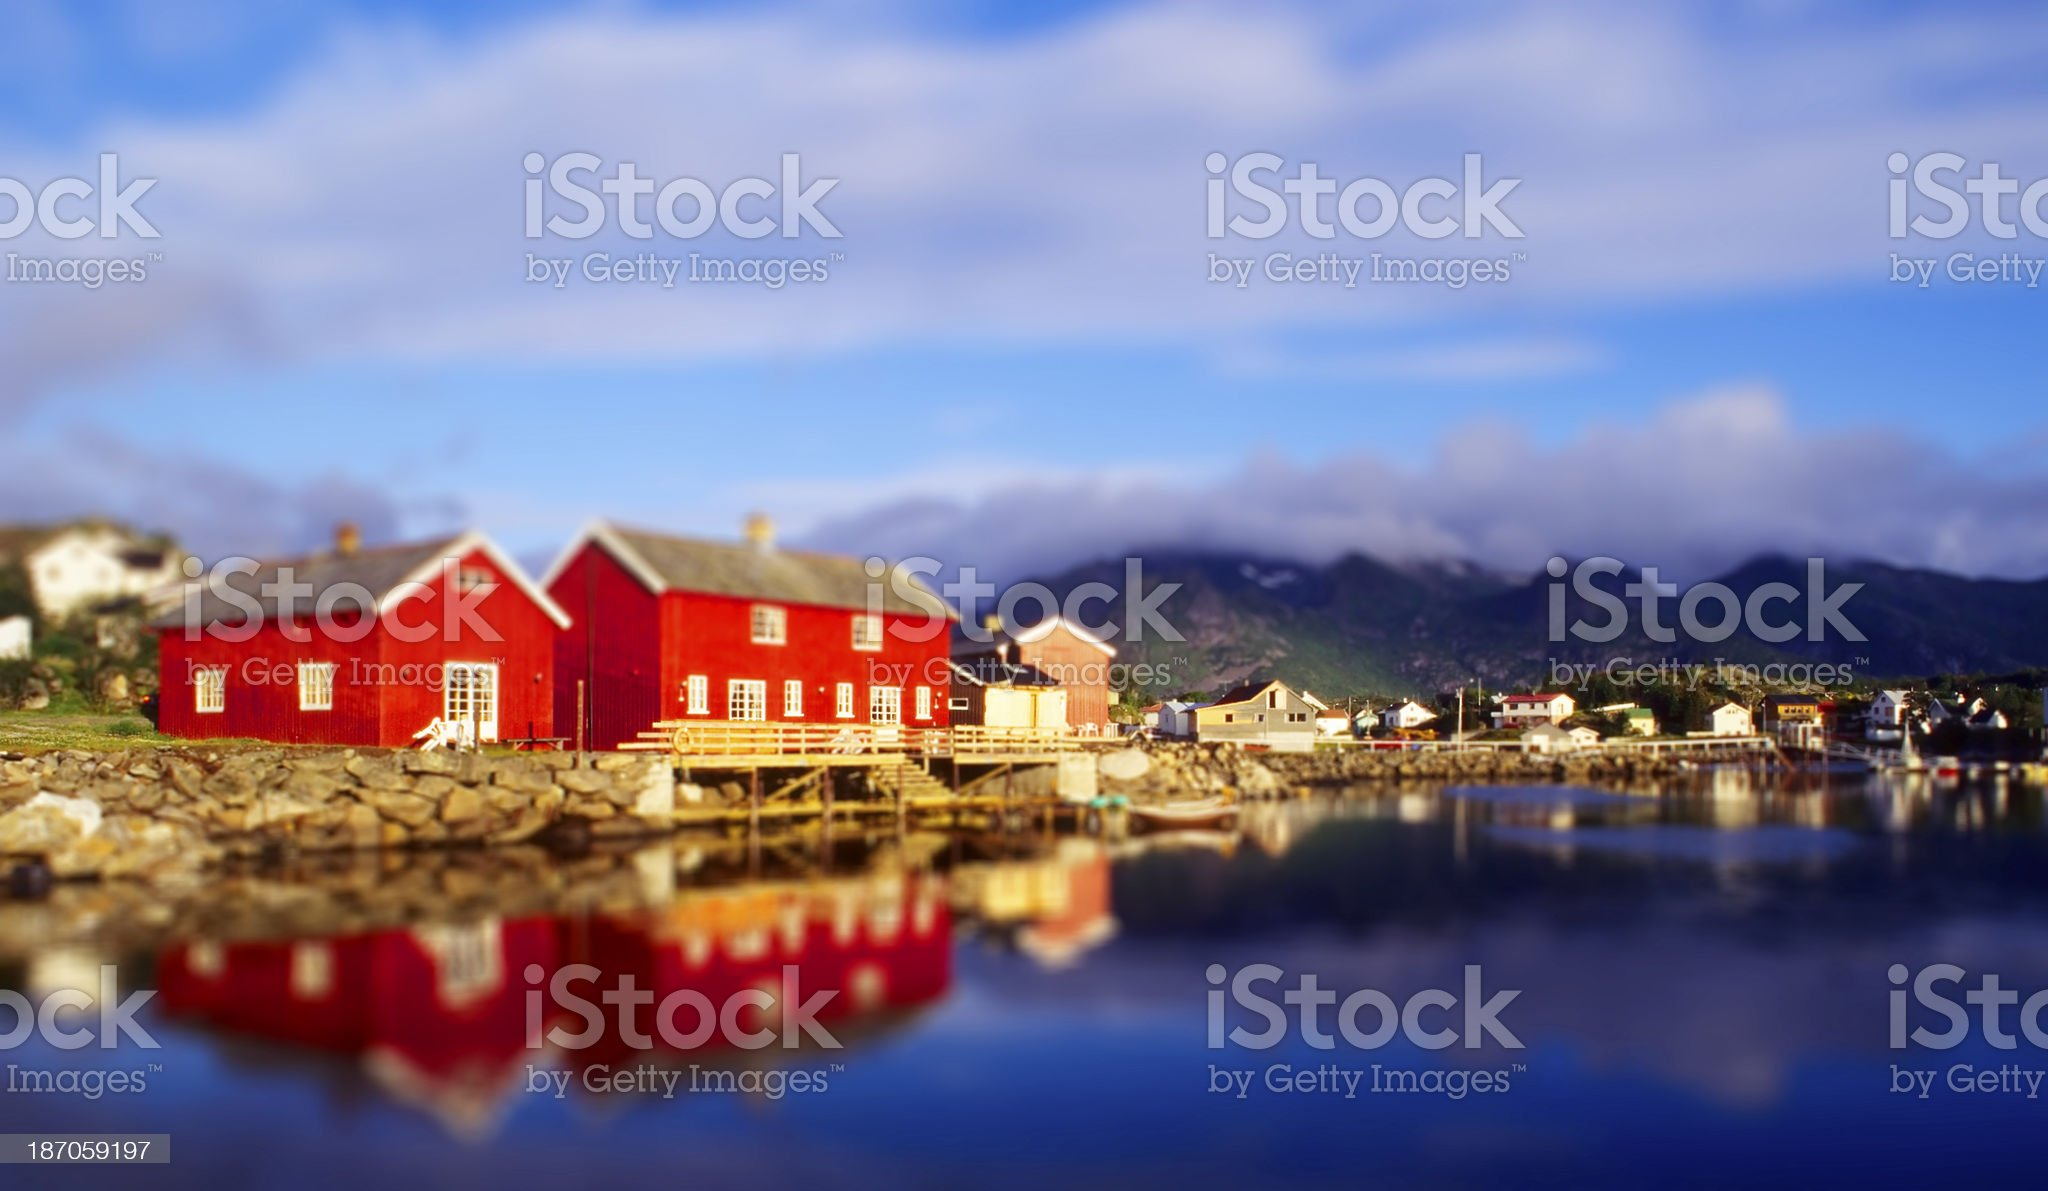 Fishermen Houses royalty-free stock photo